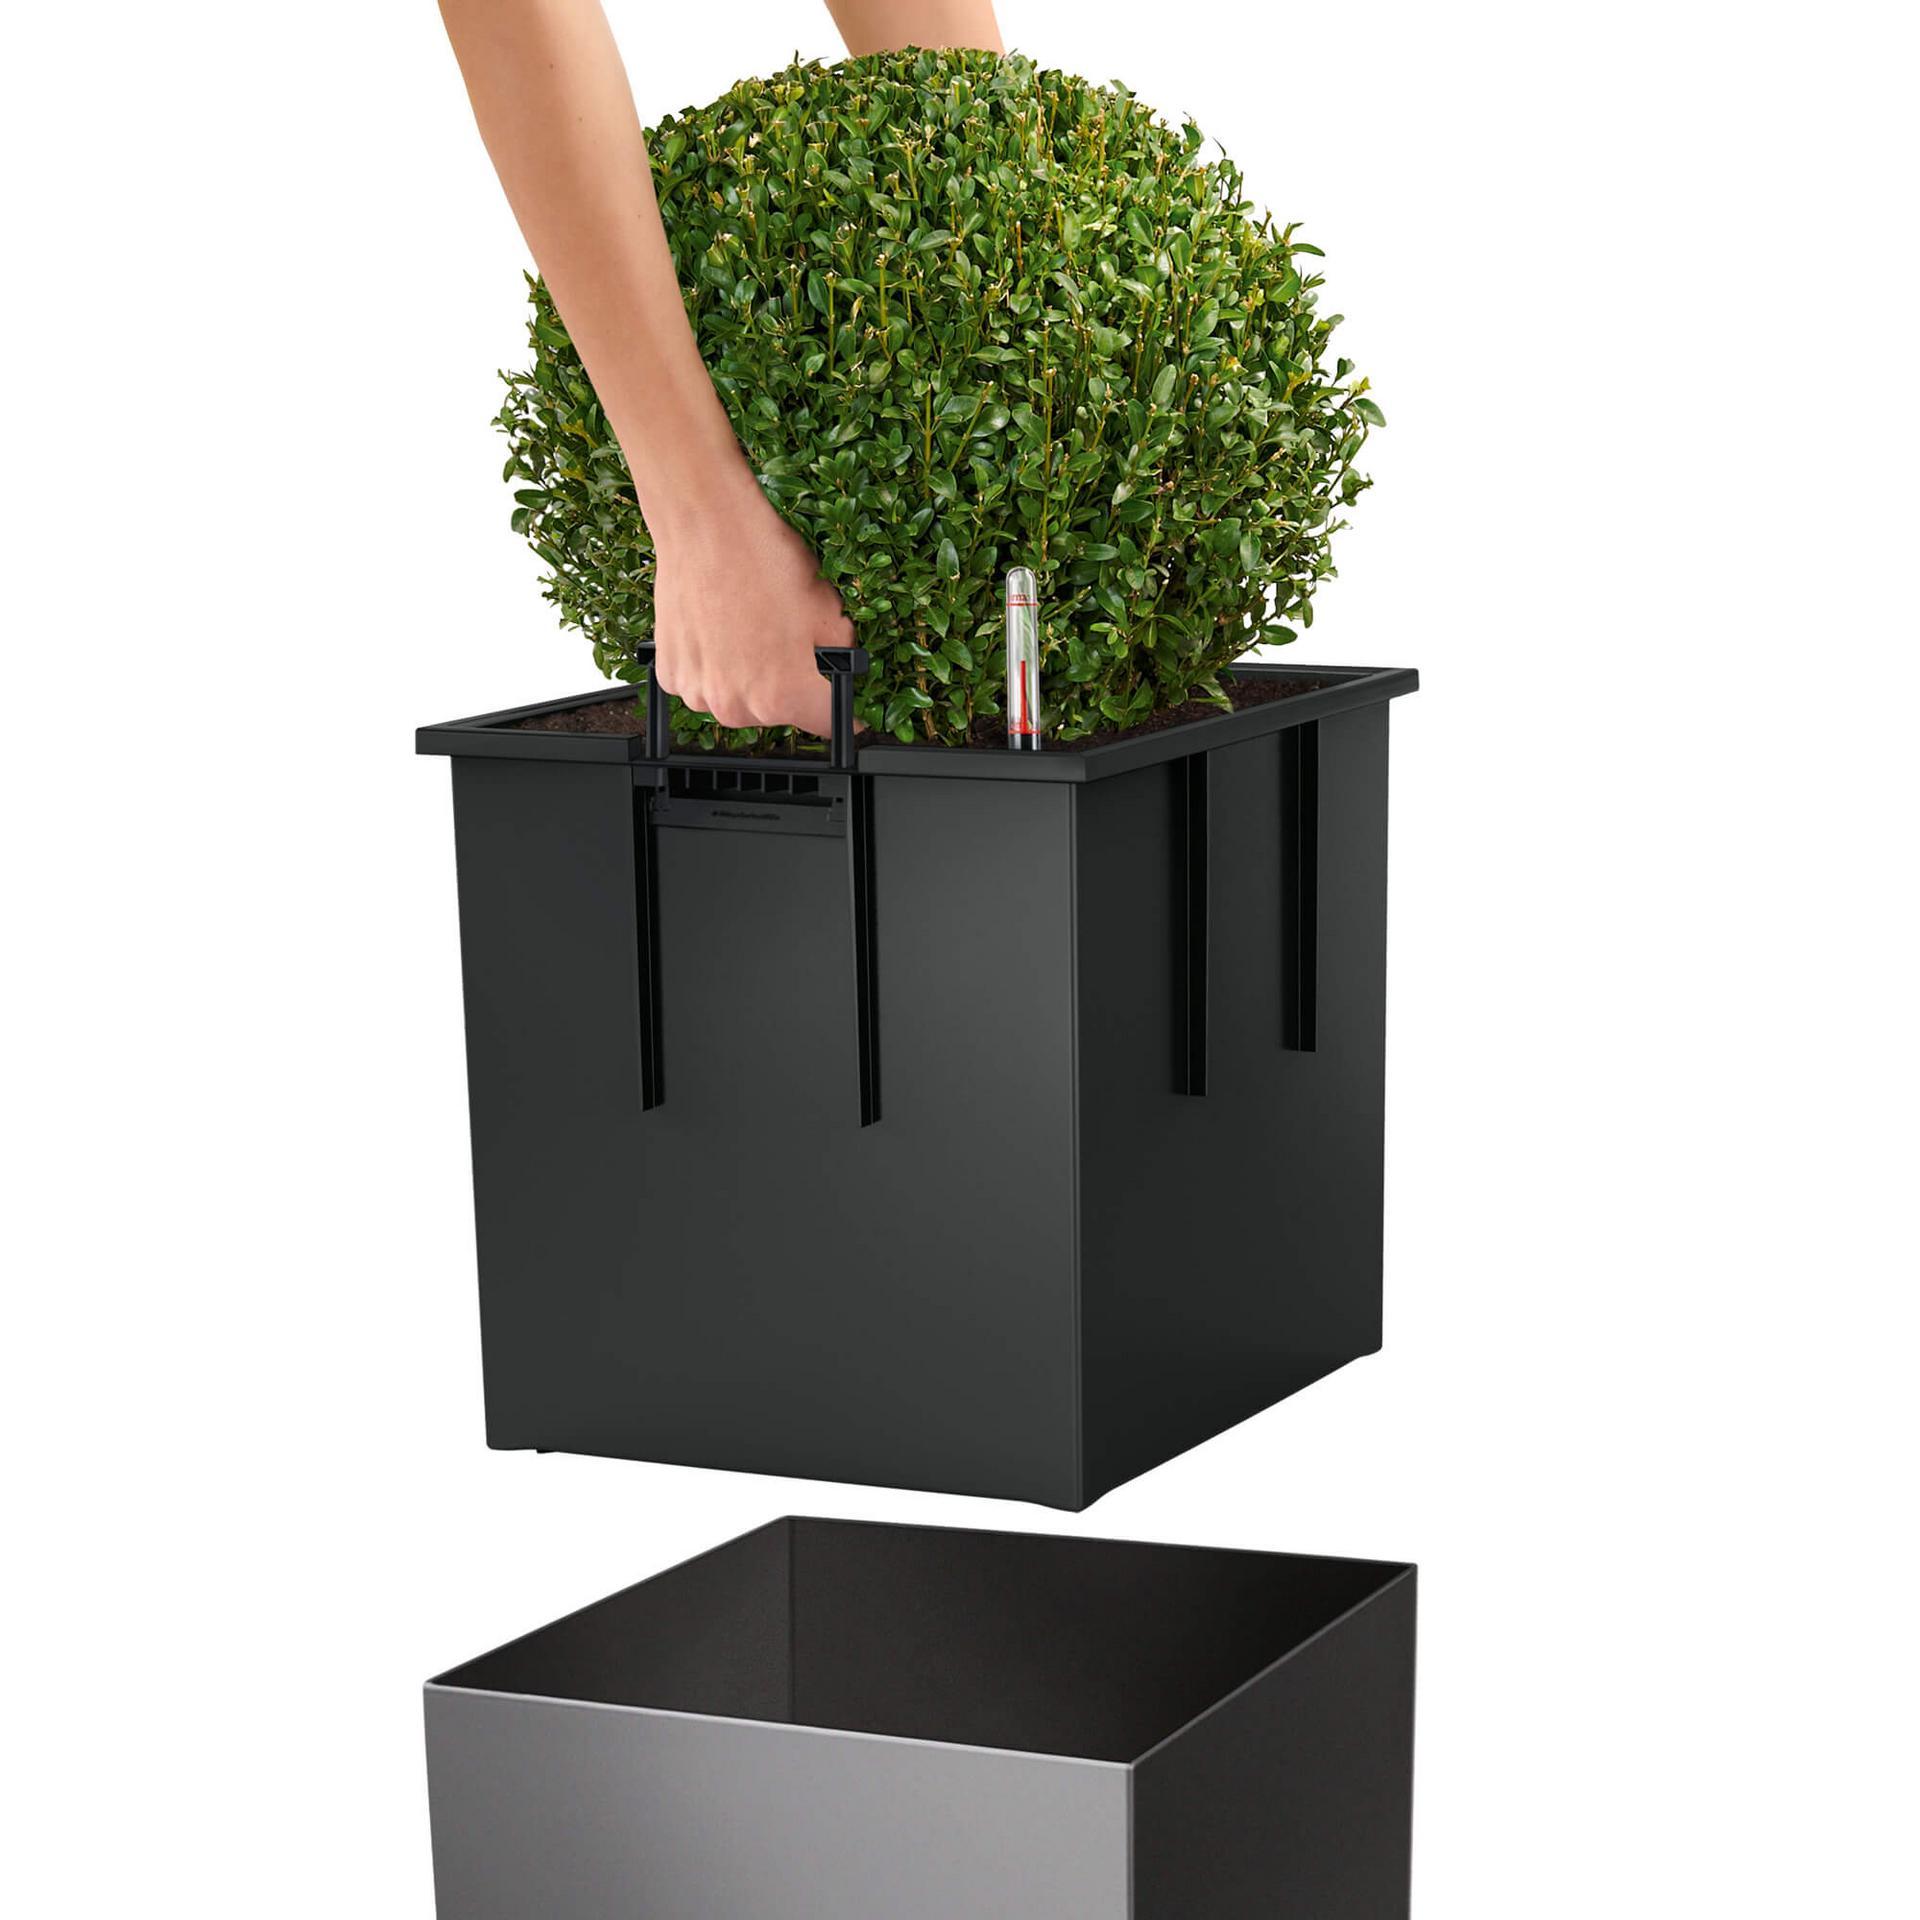 le_cube30_product_addi_liner